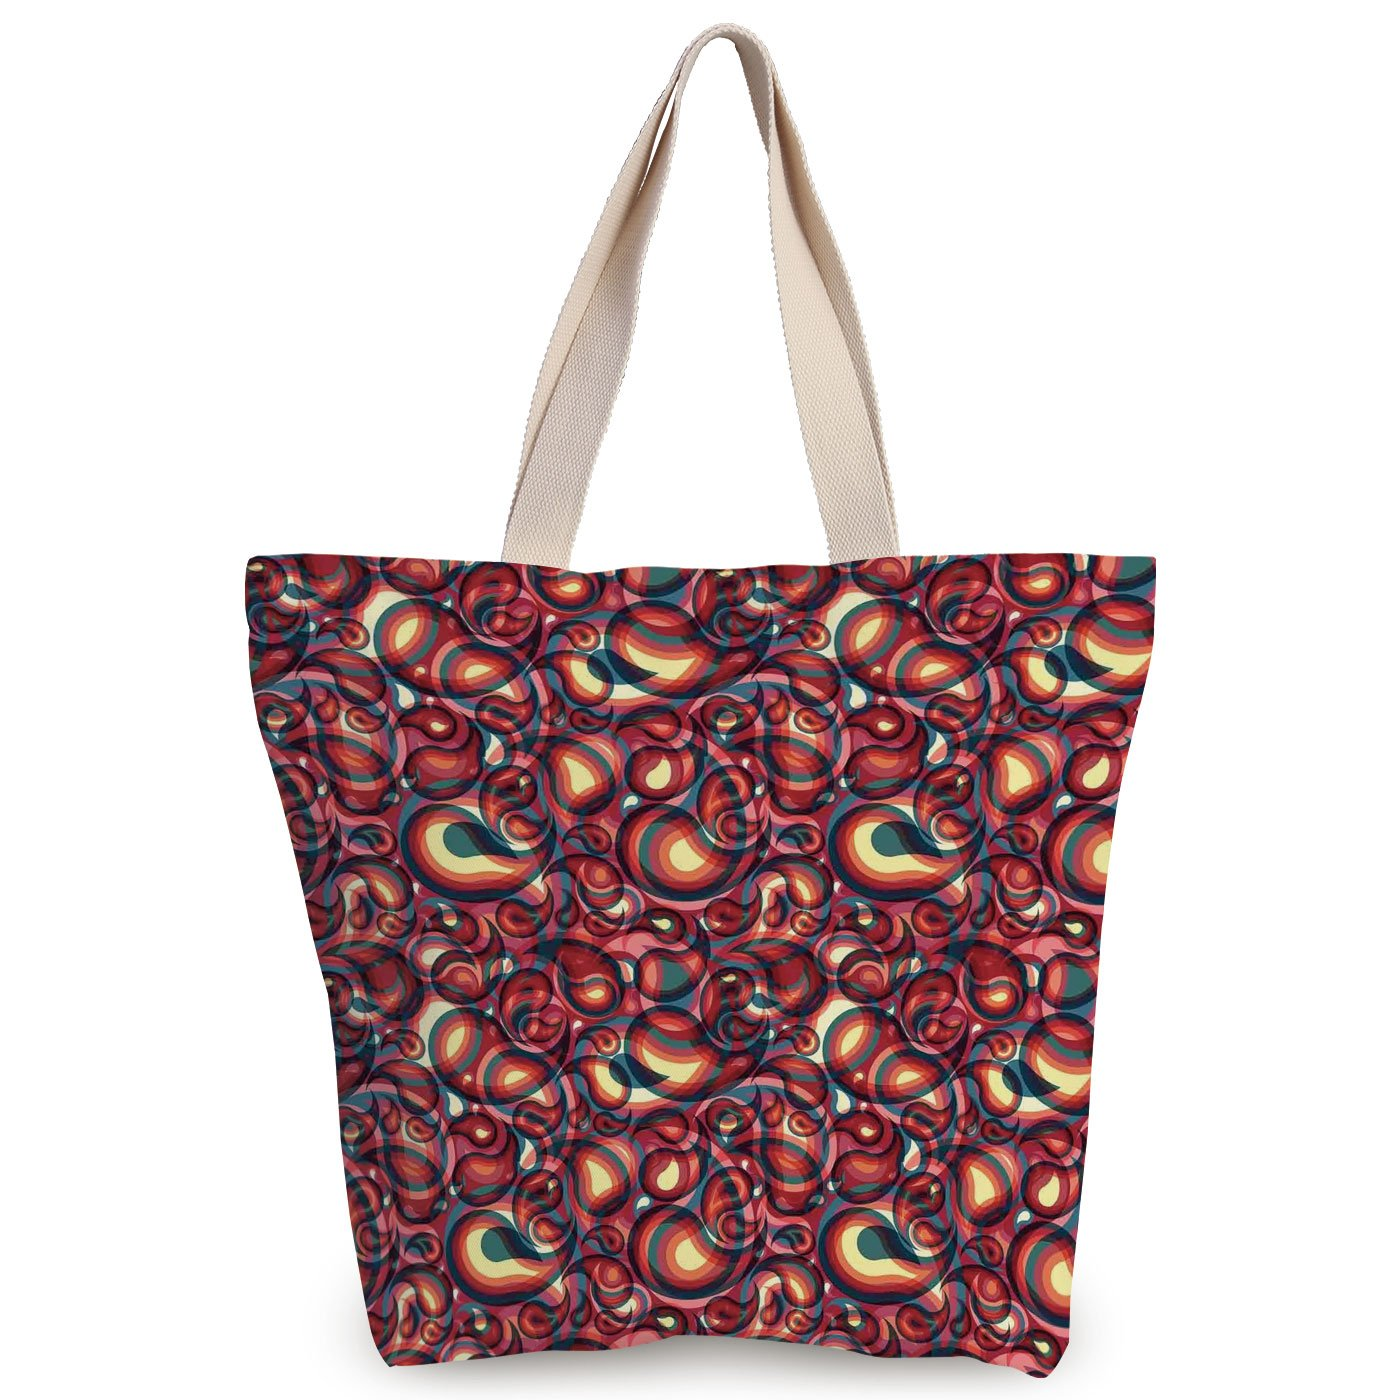 79aa778e24b Amazon.com: Personalized Canvas Tote Bag,Paisley,Modern Paisley ...